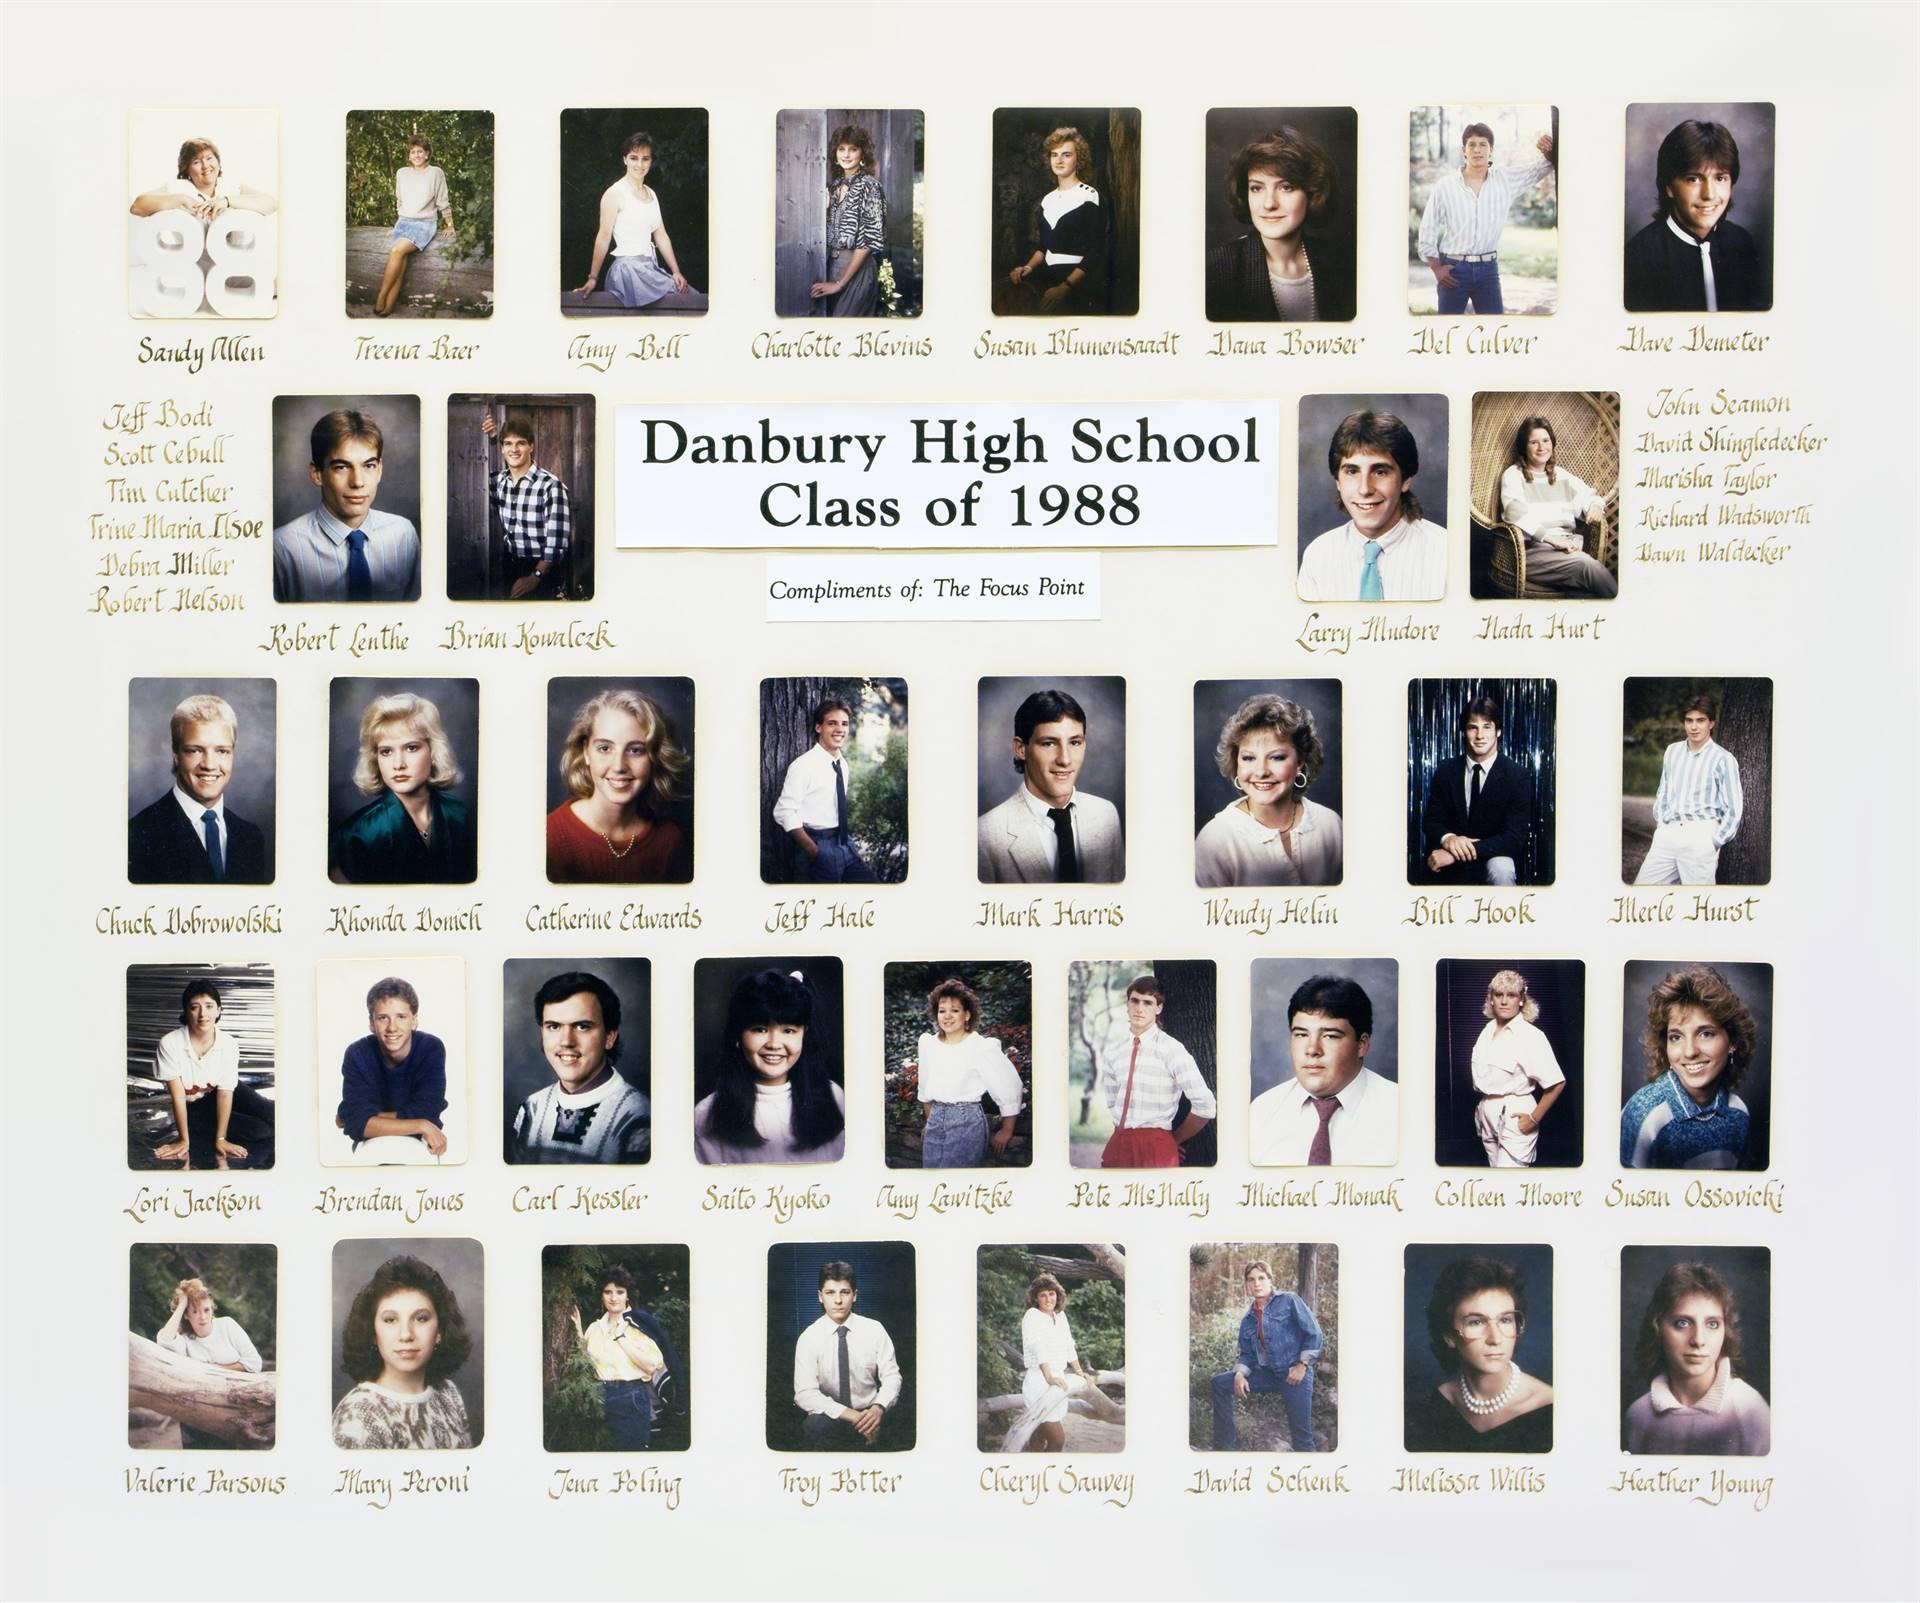 Class of 1988